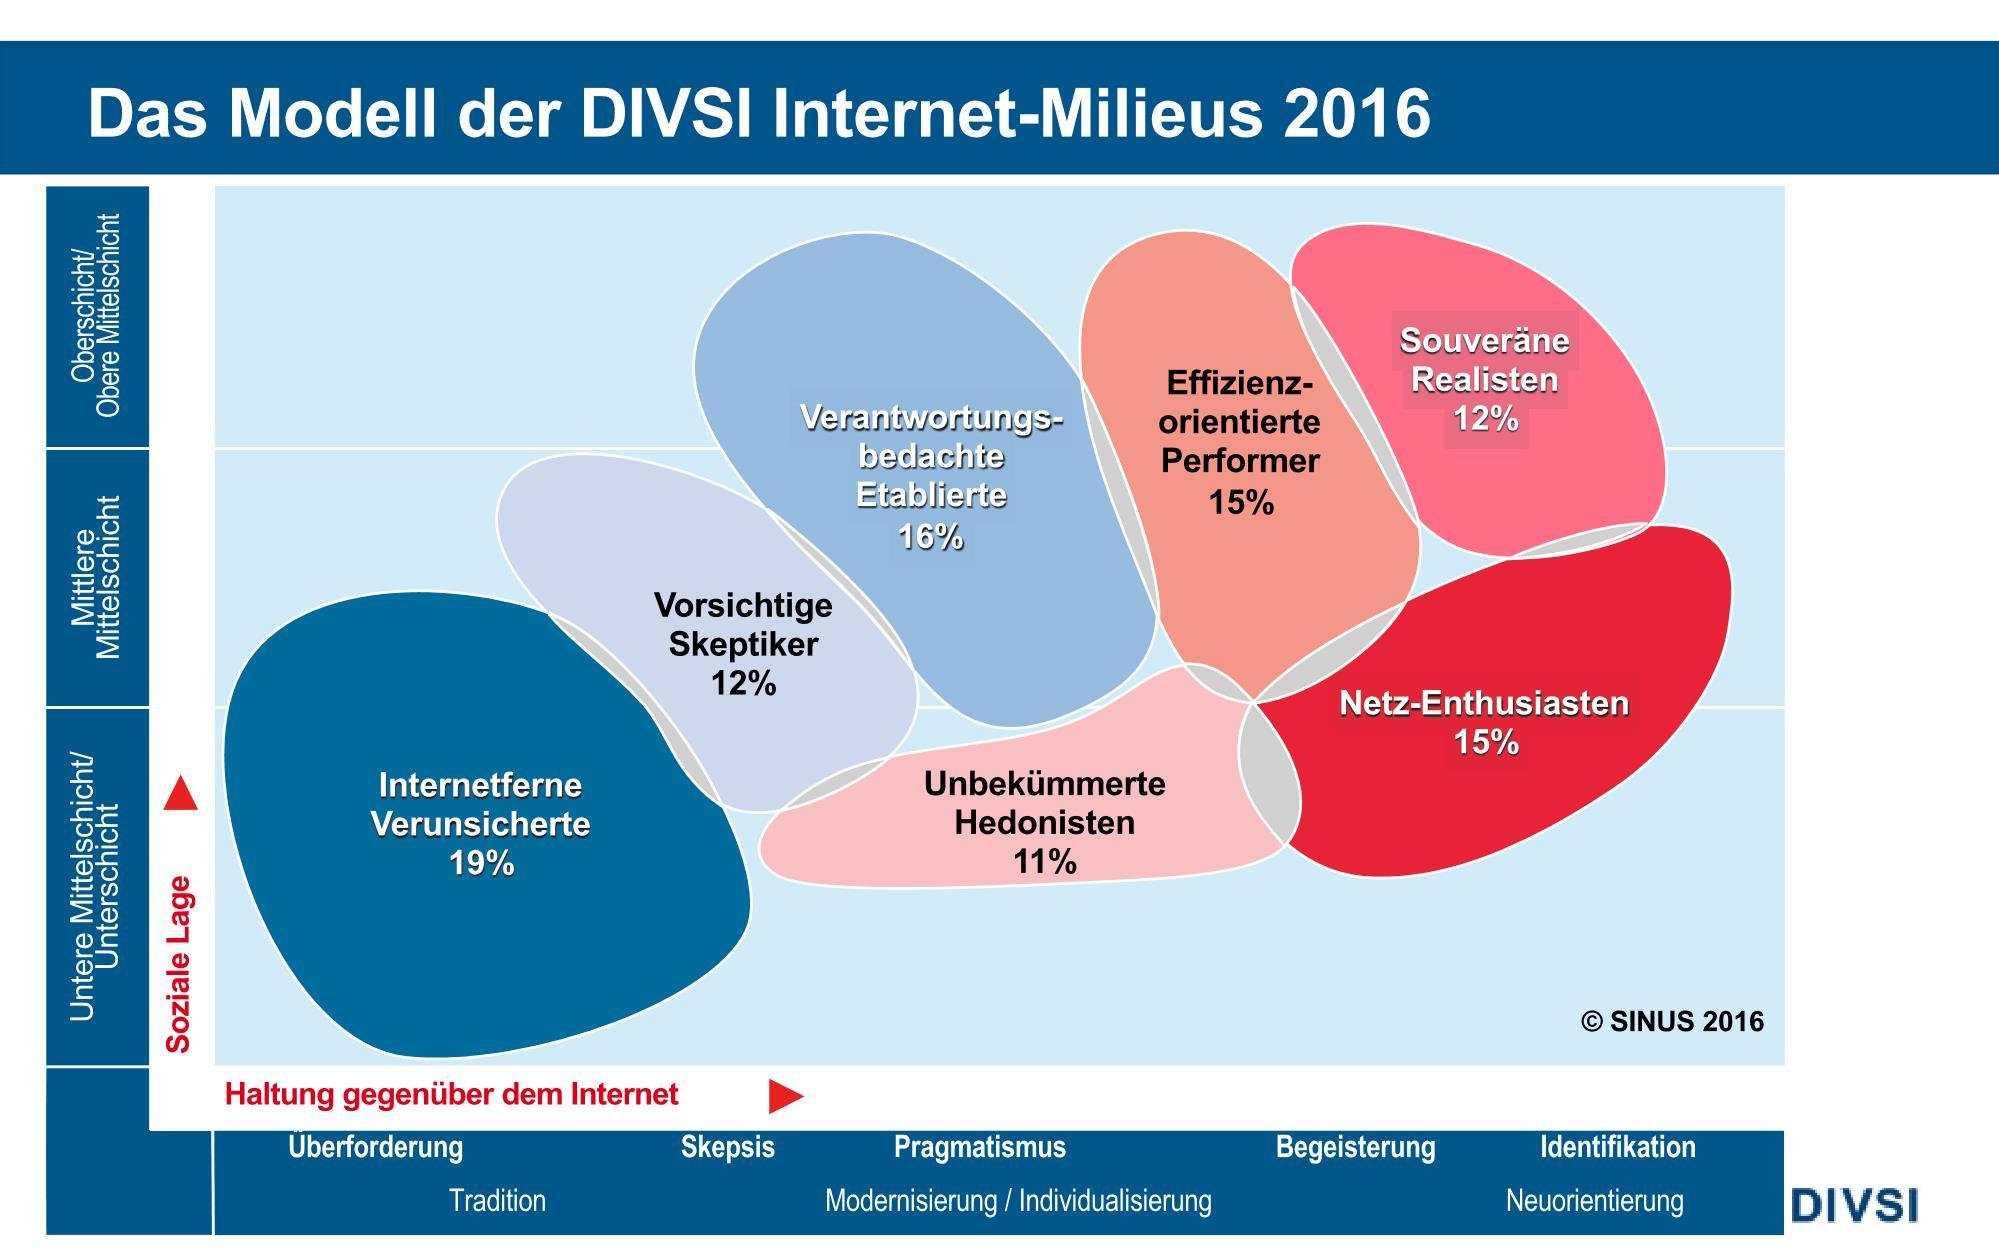 2016-06-28_PK_DIVSI-Milieus-2016_Page_17